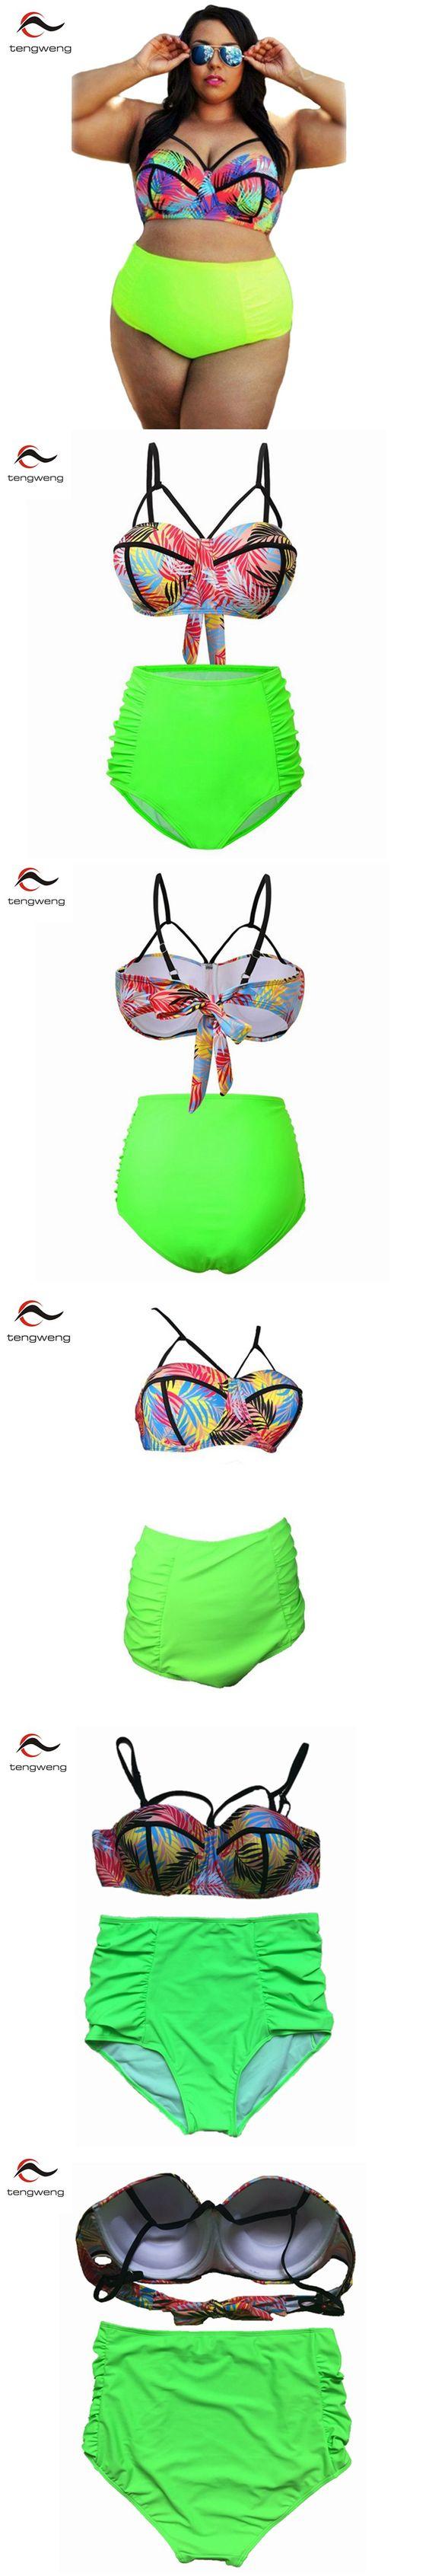 Tengweng Plus size Swimwear high Waisted Bathing Suit Womens Push Up Padded Floral Strappy Bikini Swimsuit Set 2XL-5XL Free Send $13.9